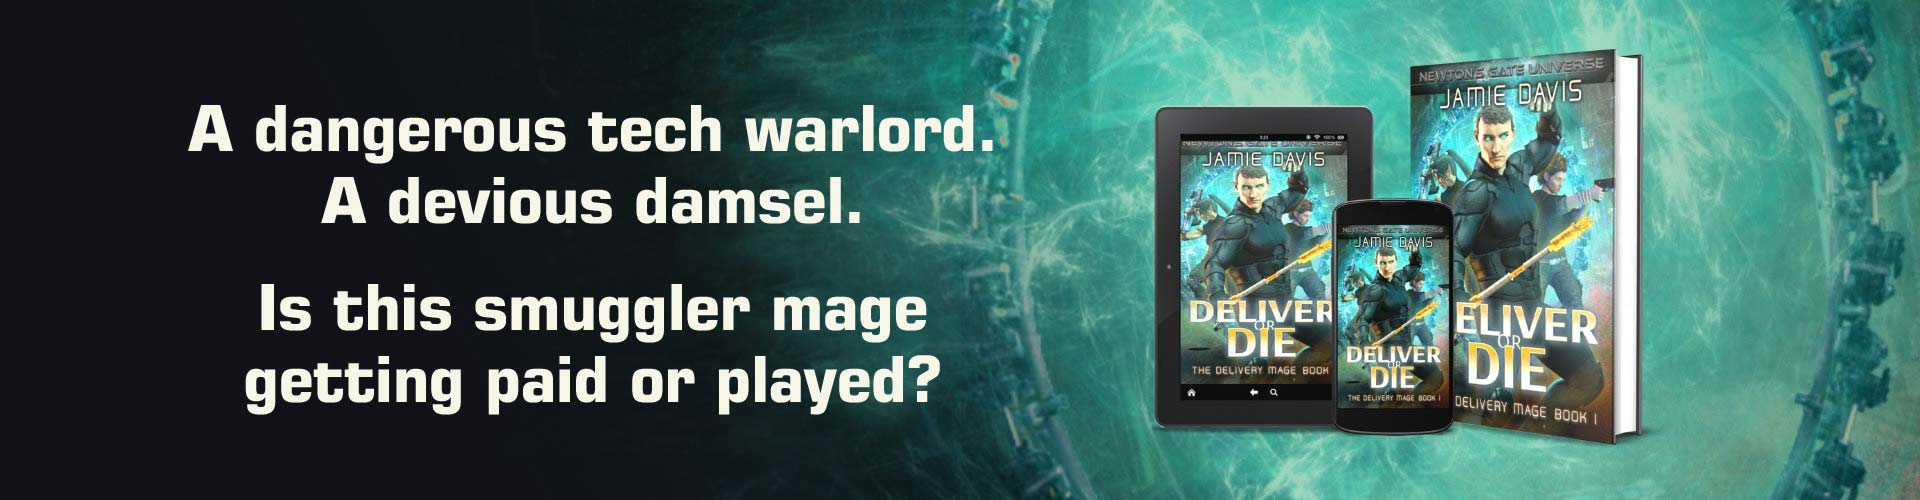 The Delivery Mage Portal Urban Fantasy Series